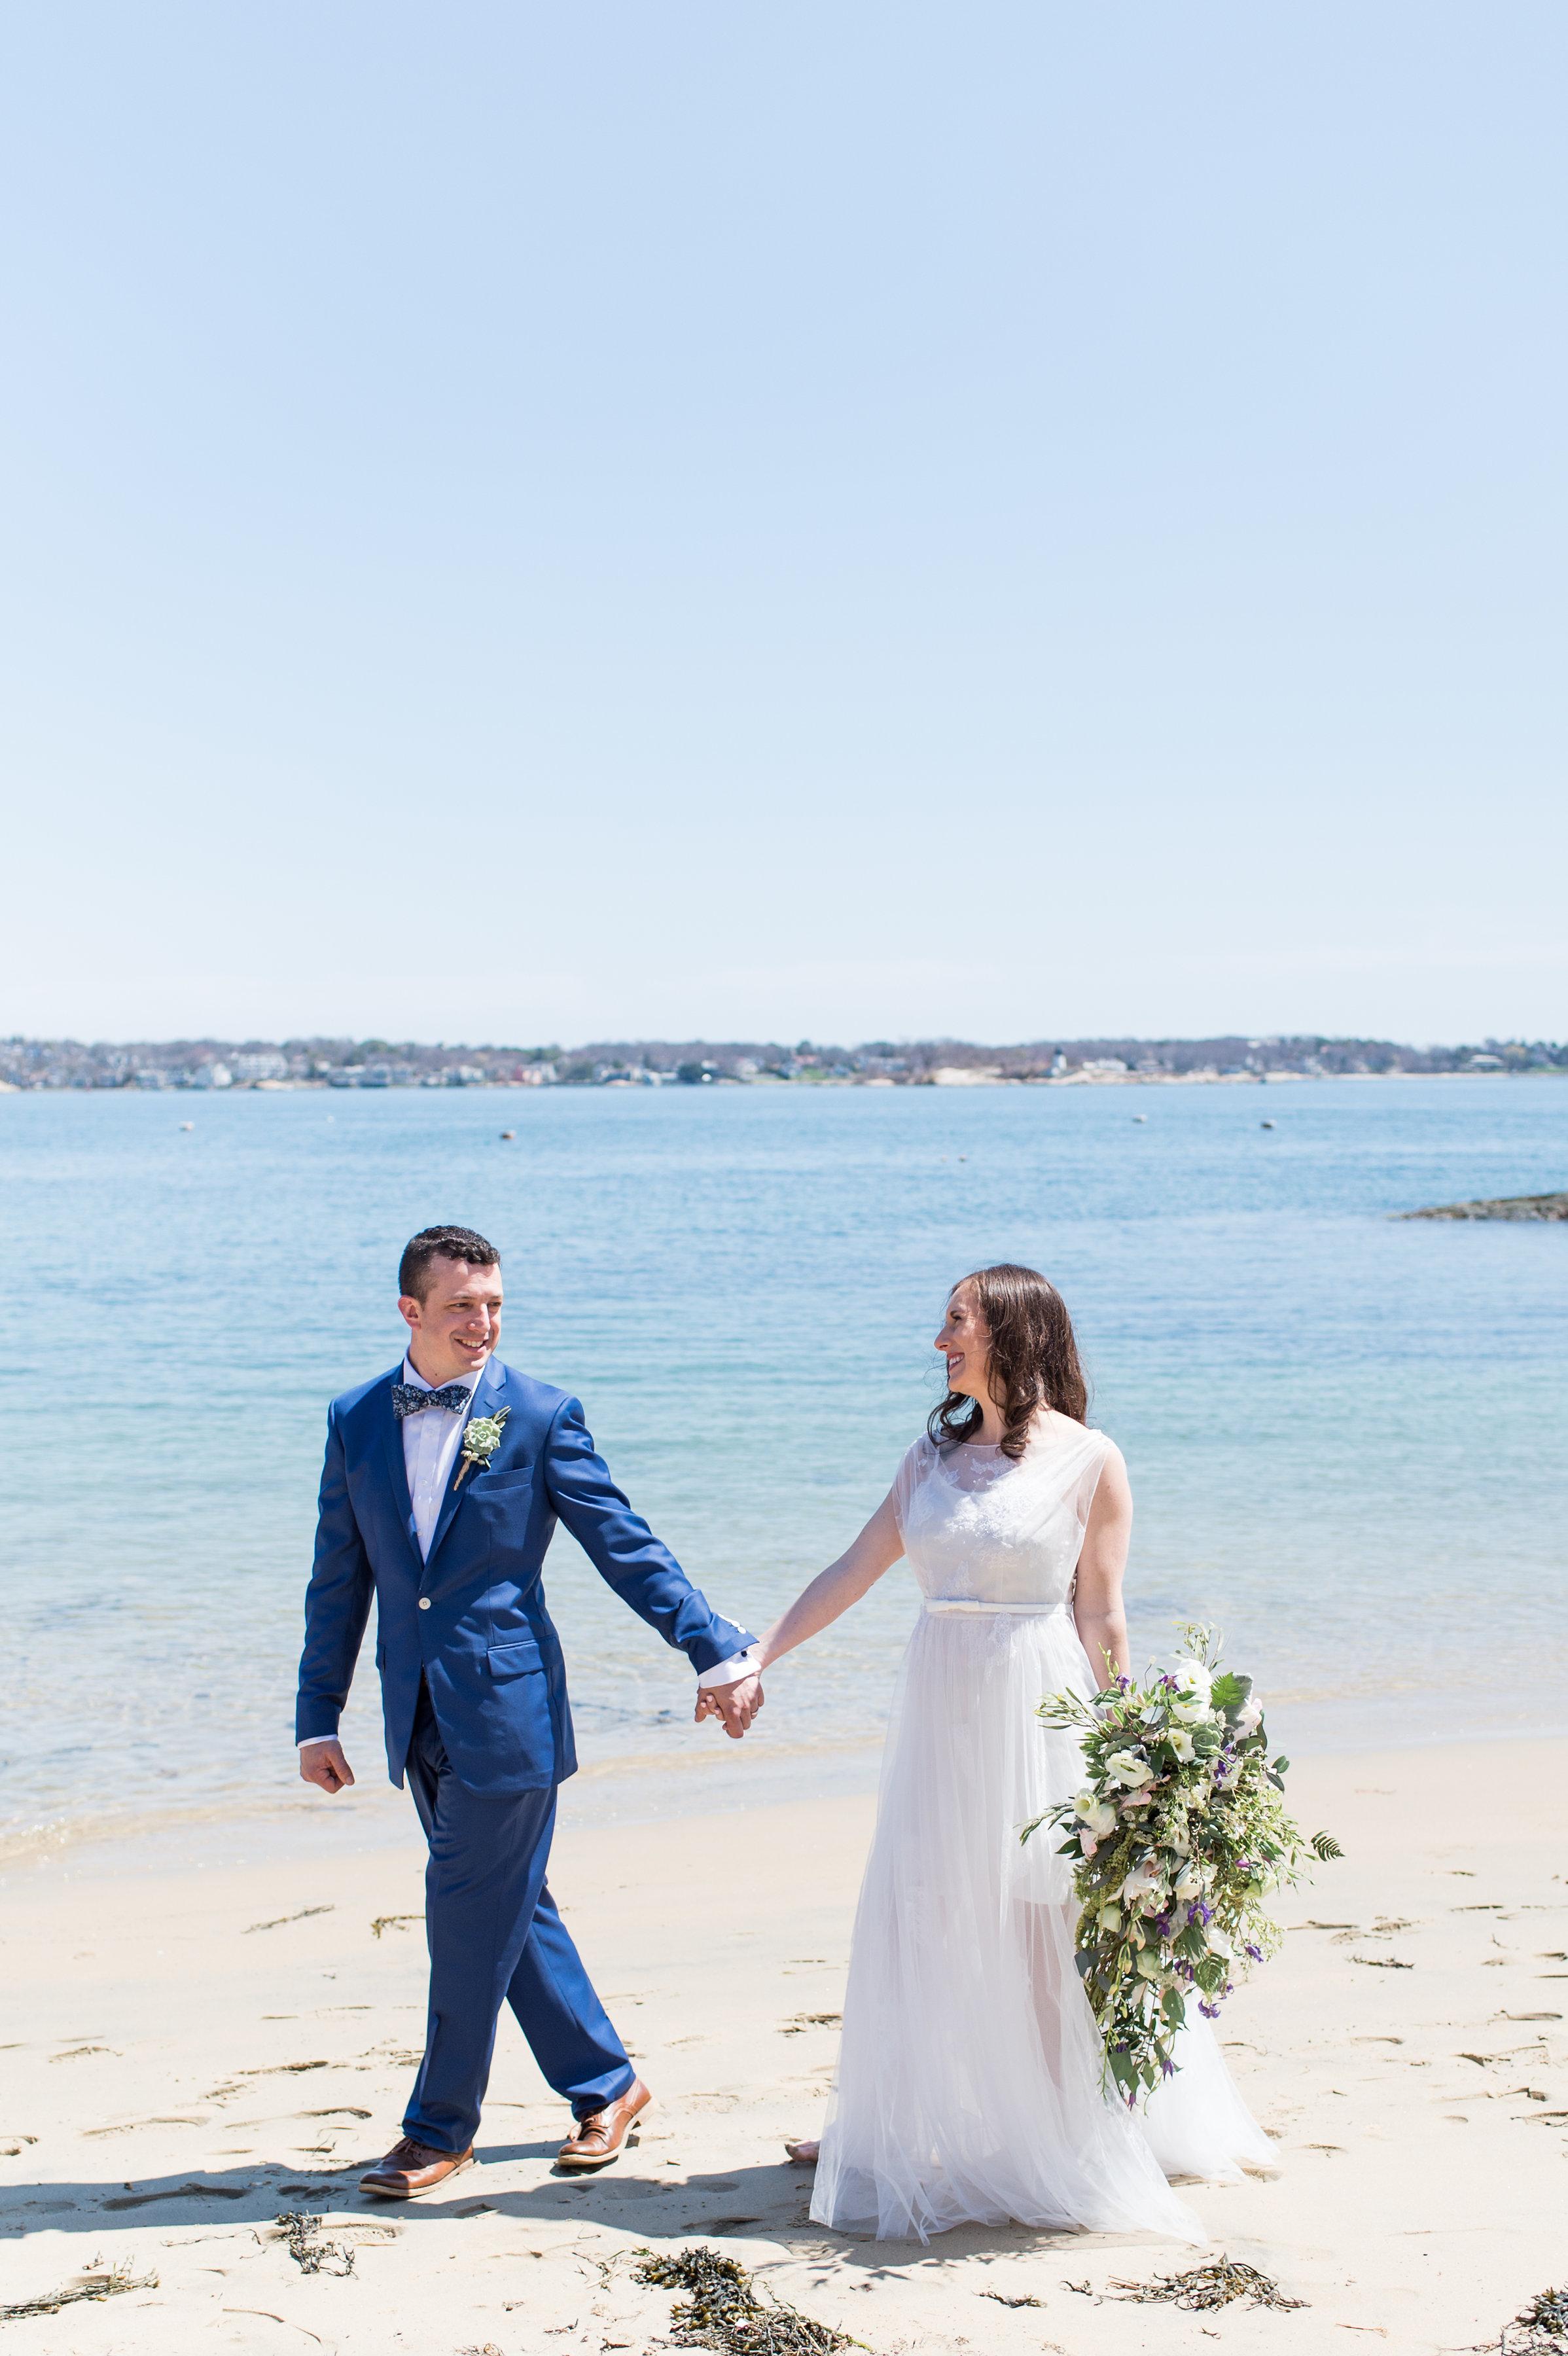 beach water side wedding photography summer wedding lightweight summer wedding gown custom made wedding dress under $1000